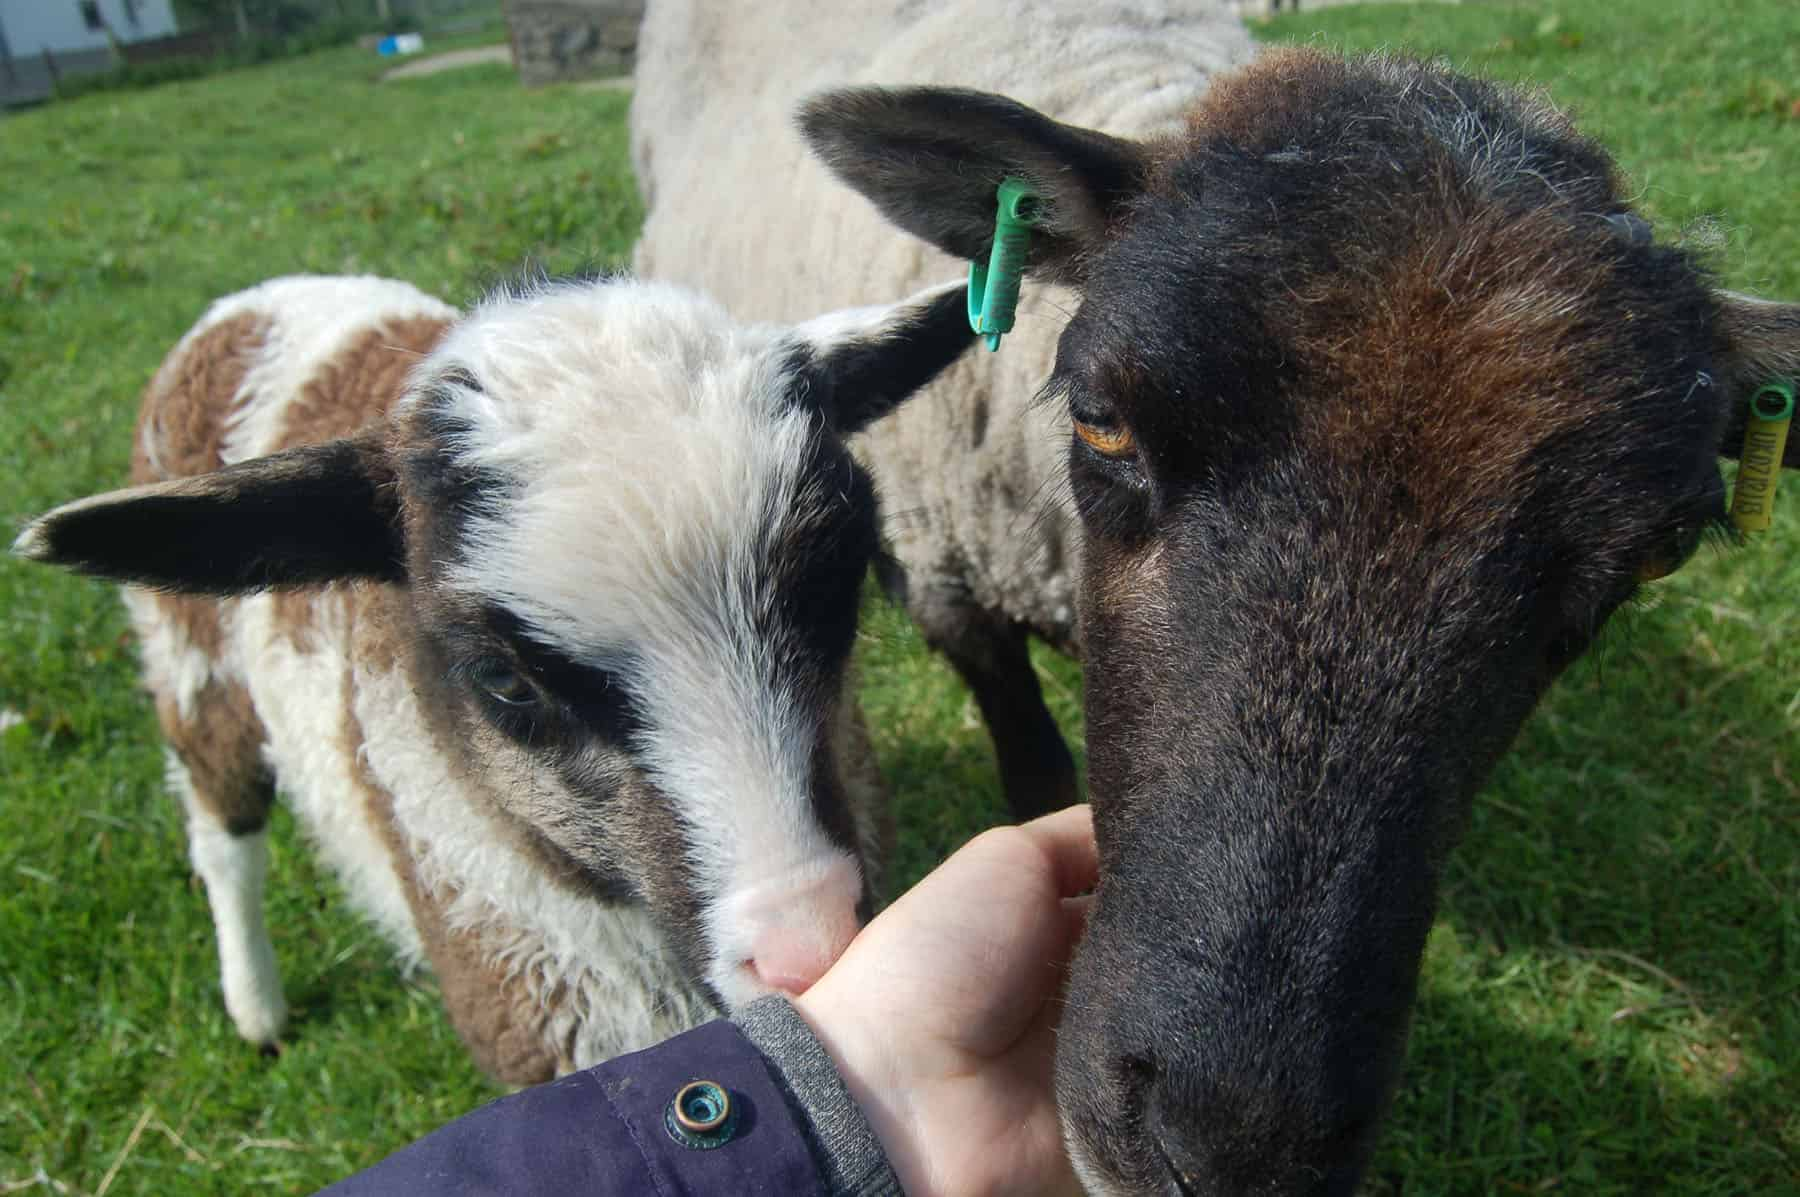 Waffle and Daffodil primitive crossbreed fiber sheep